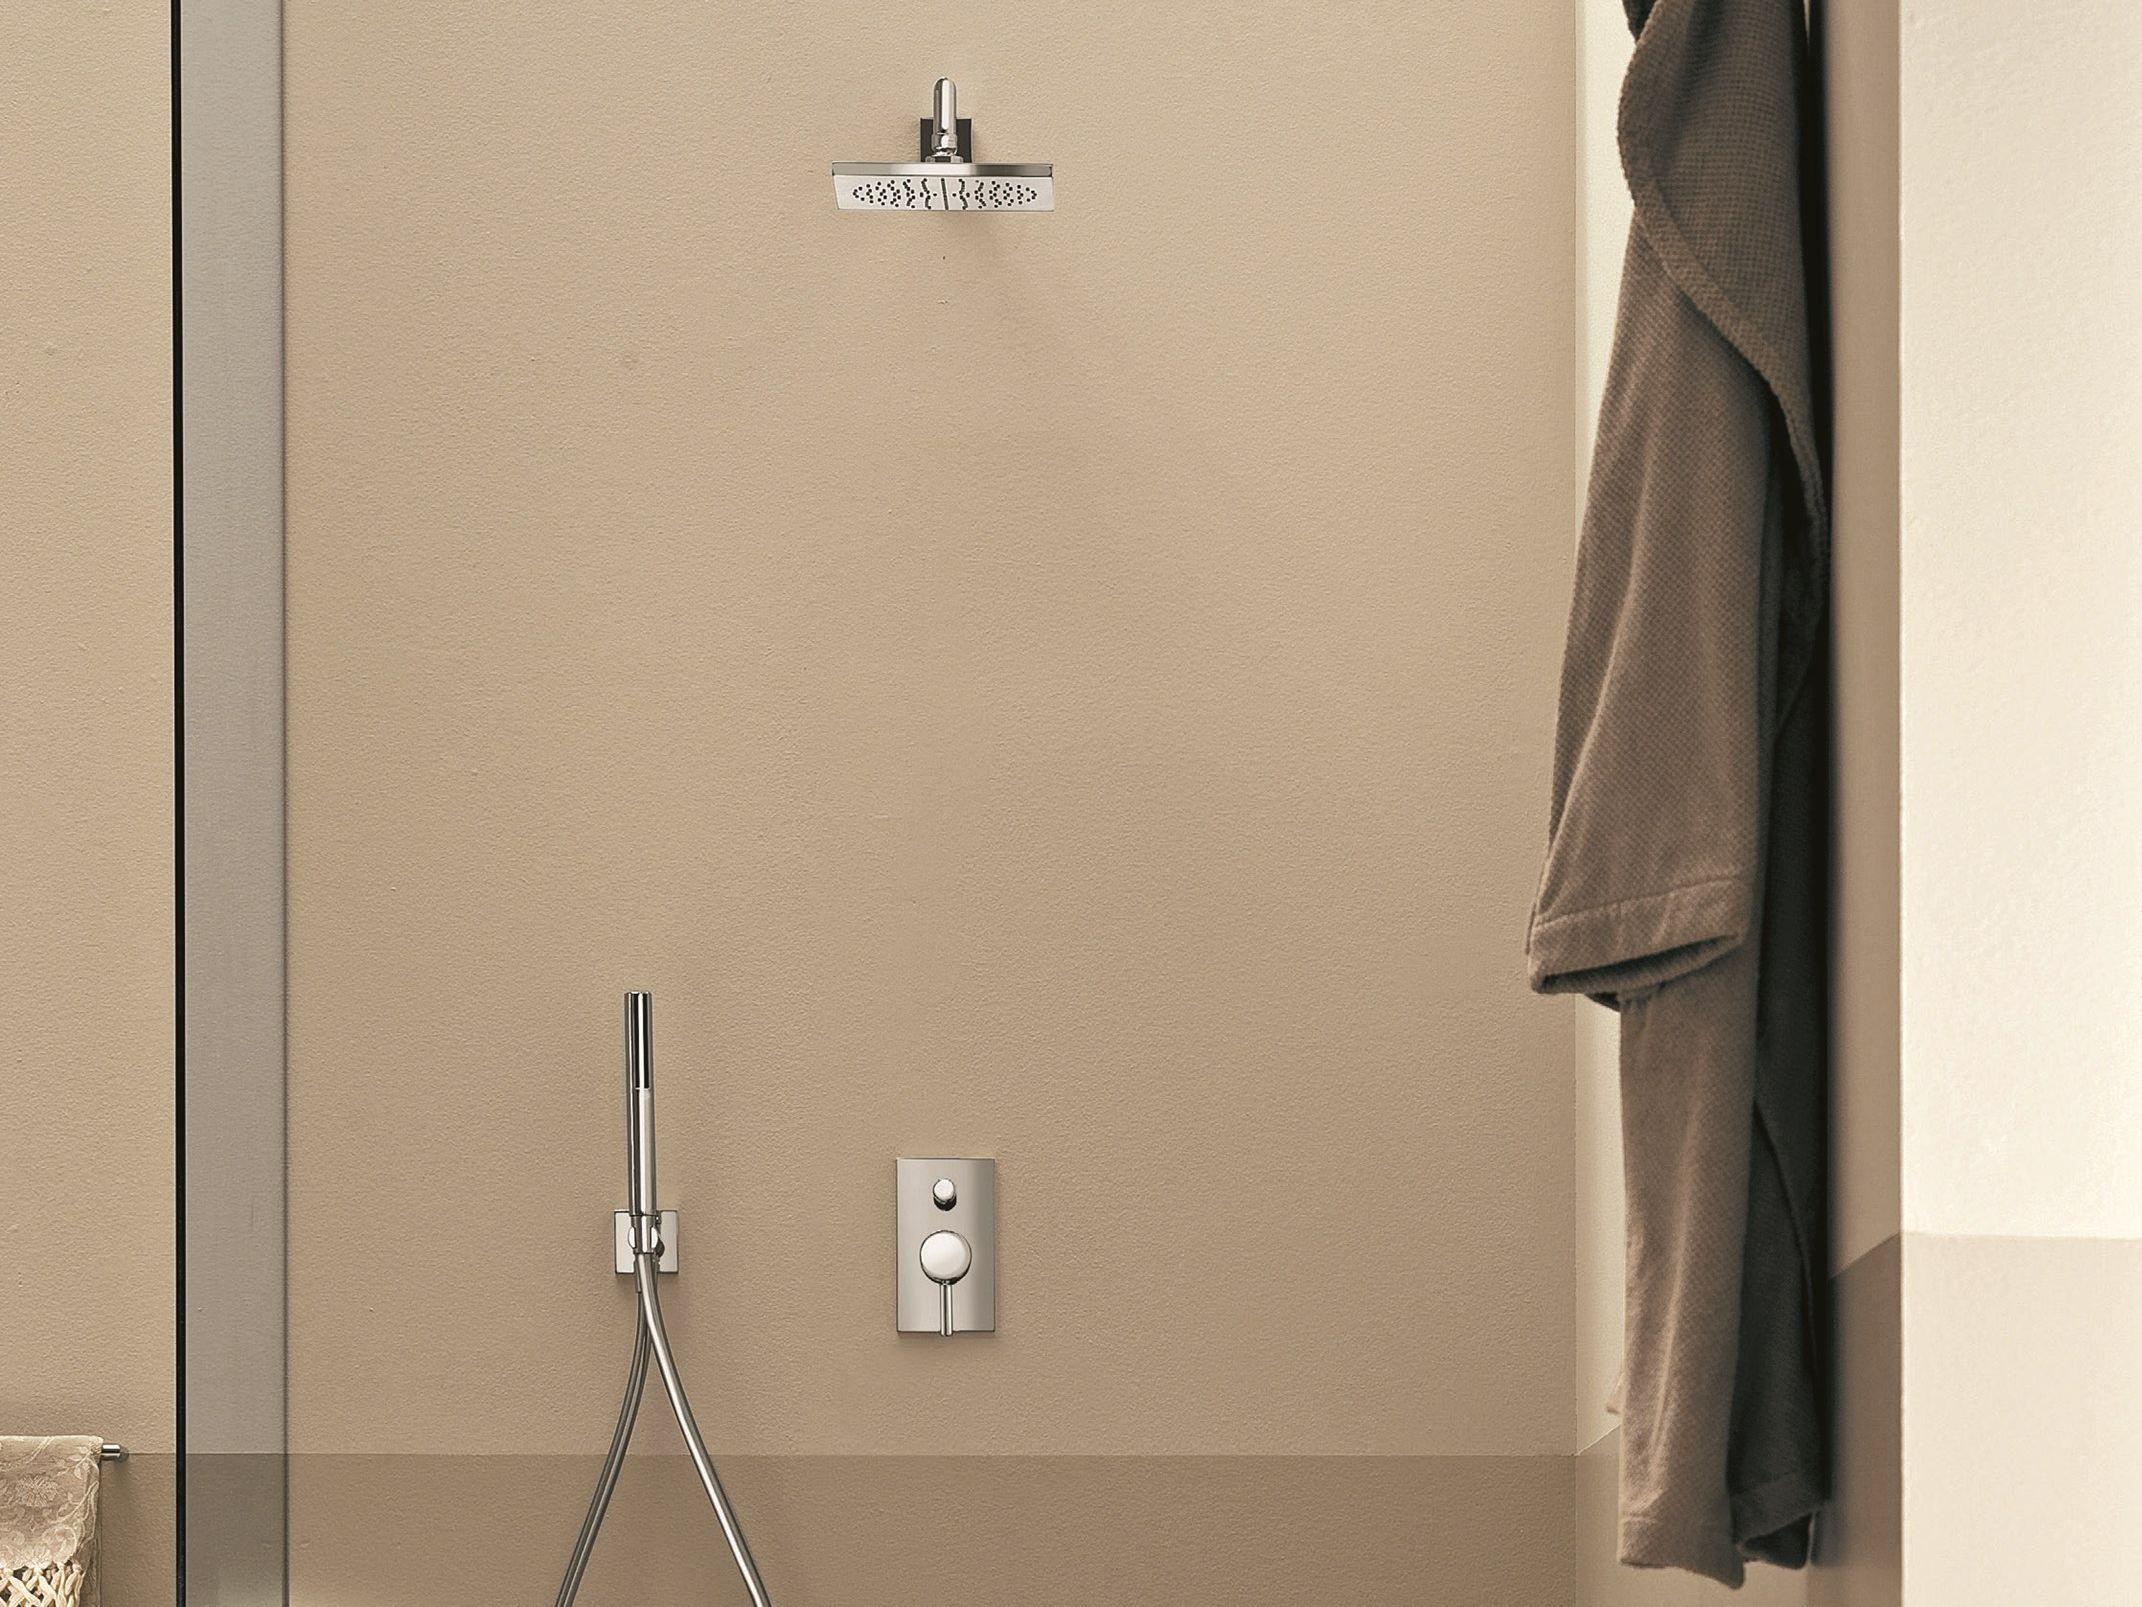 nostromo dusche mischbatterie mit platte by fantini. Black Bedroom Furniture Sets. Home Design Ideas